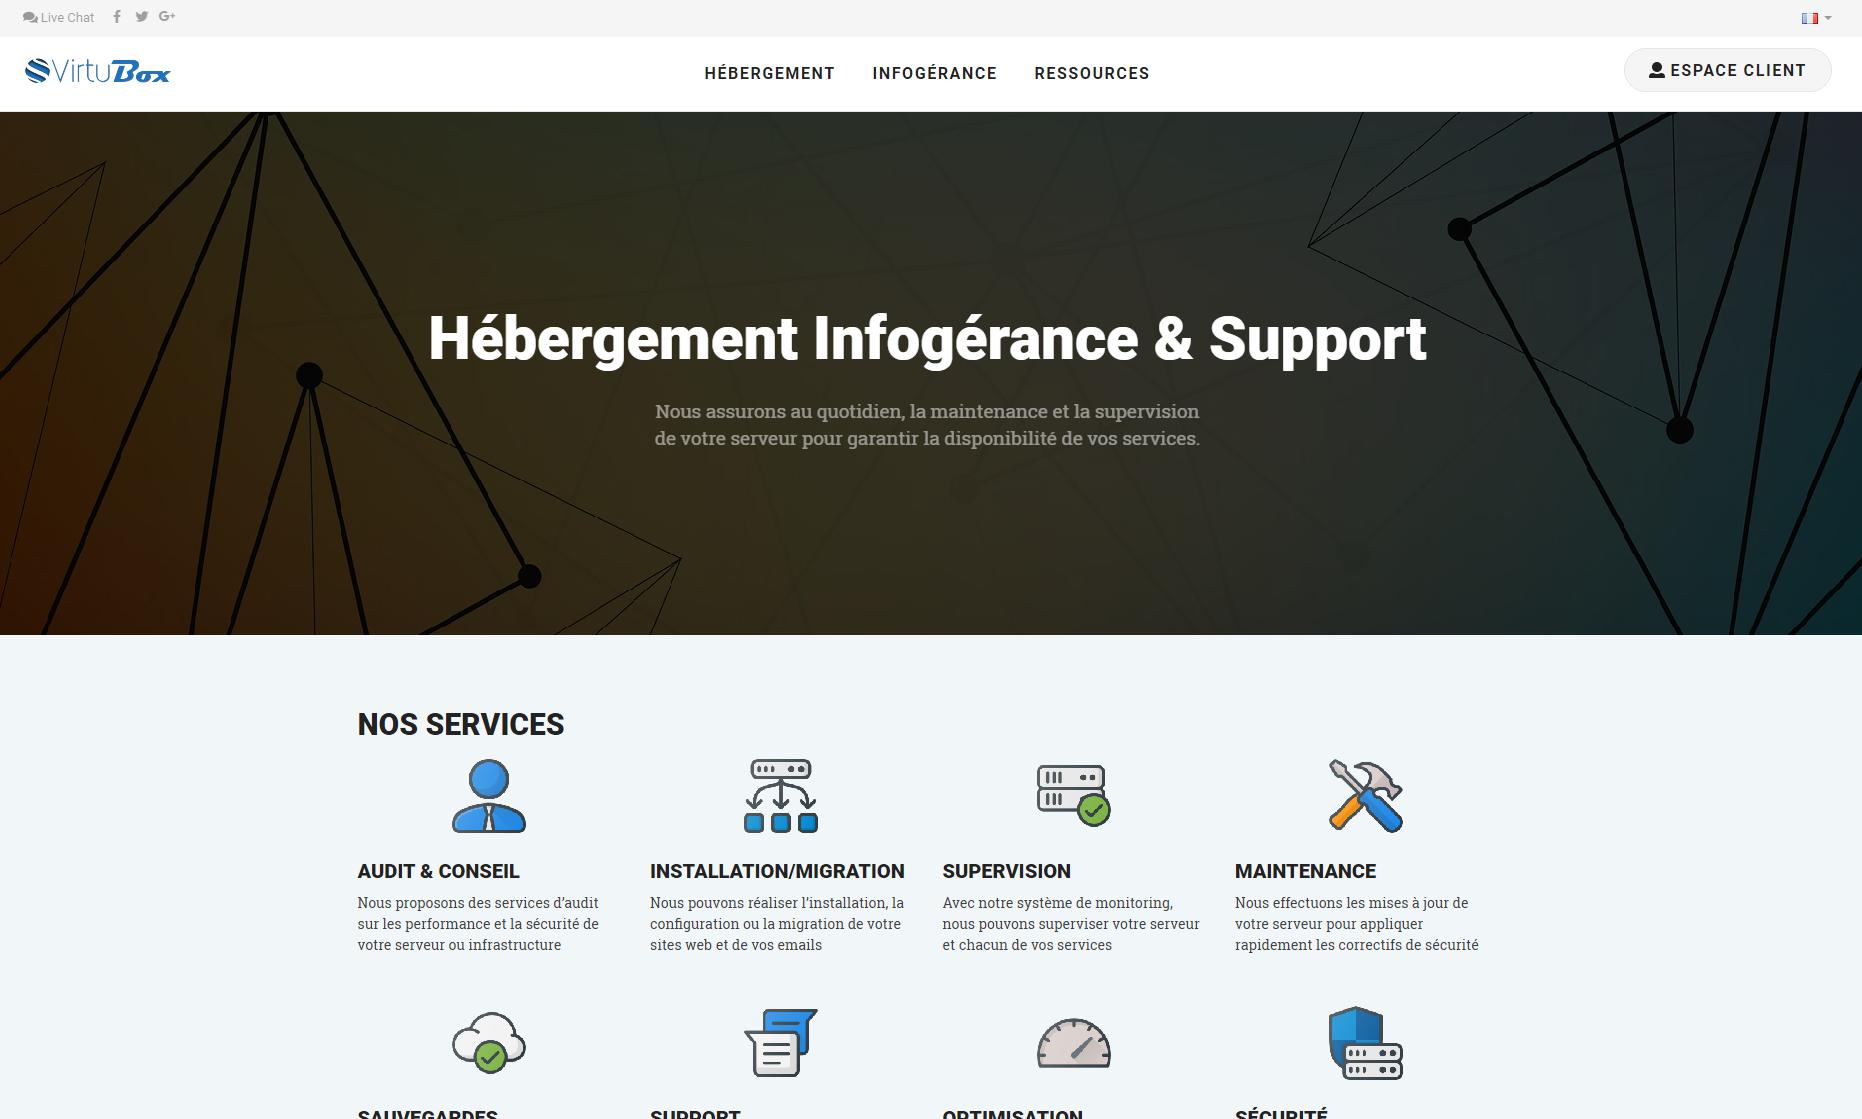 Contributions & Free Services - VirtuBox